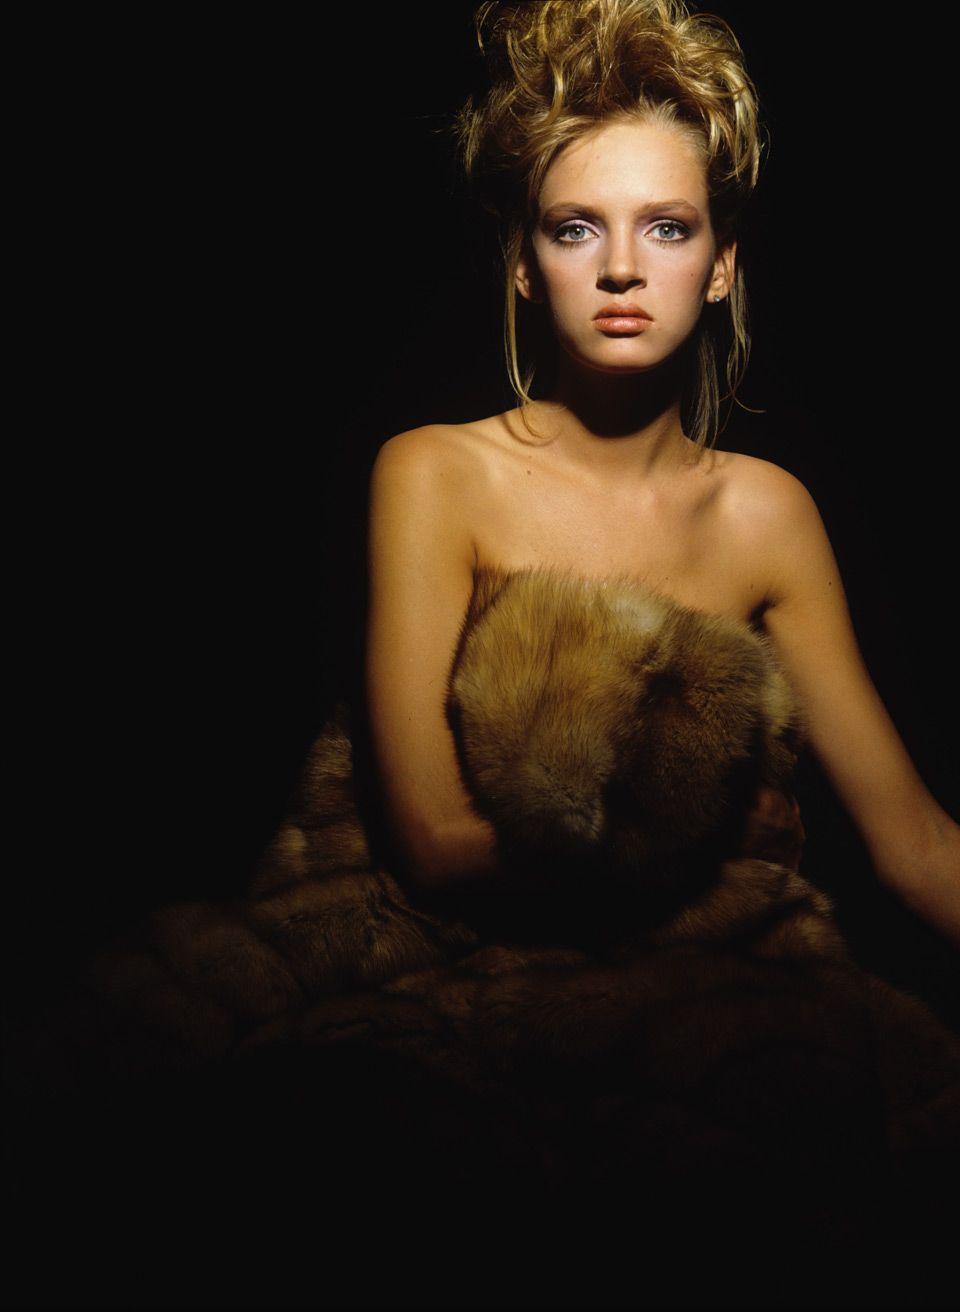 1985 год. Ума Турман для журнала Vogue. Фото: Andrea Blanch